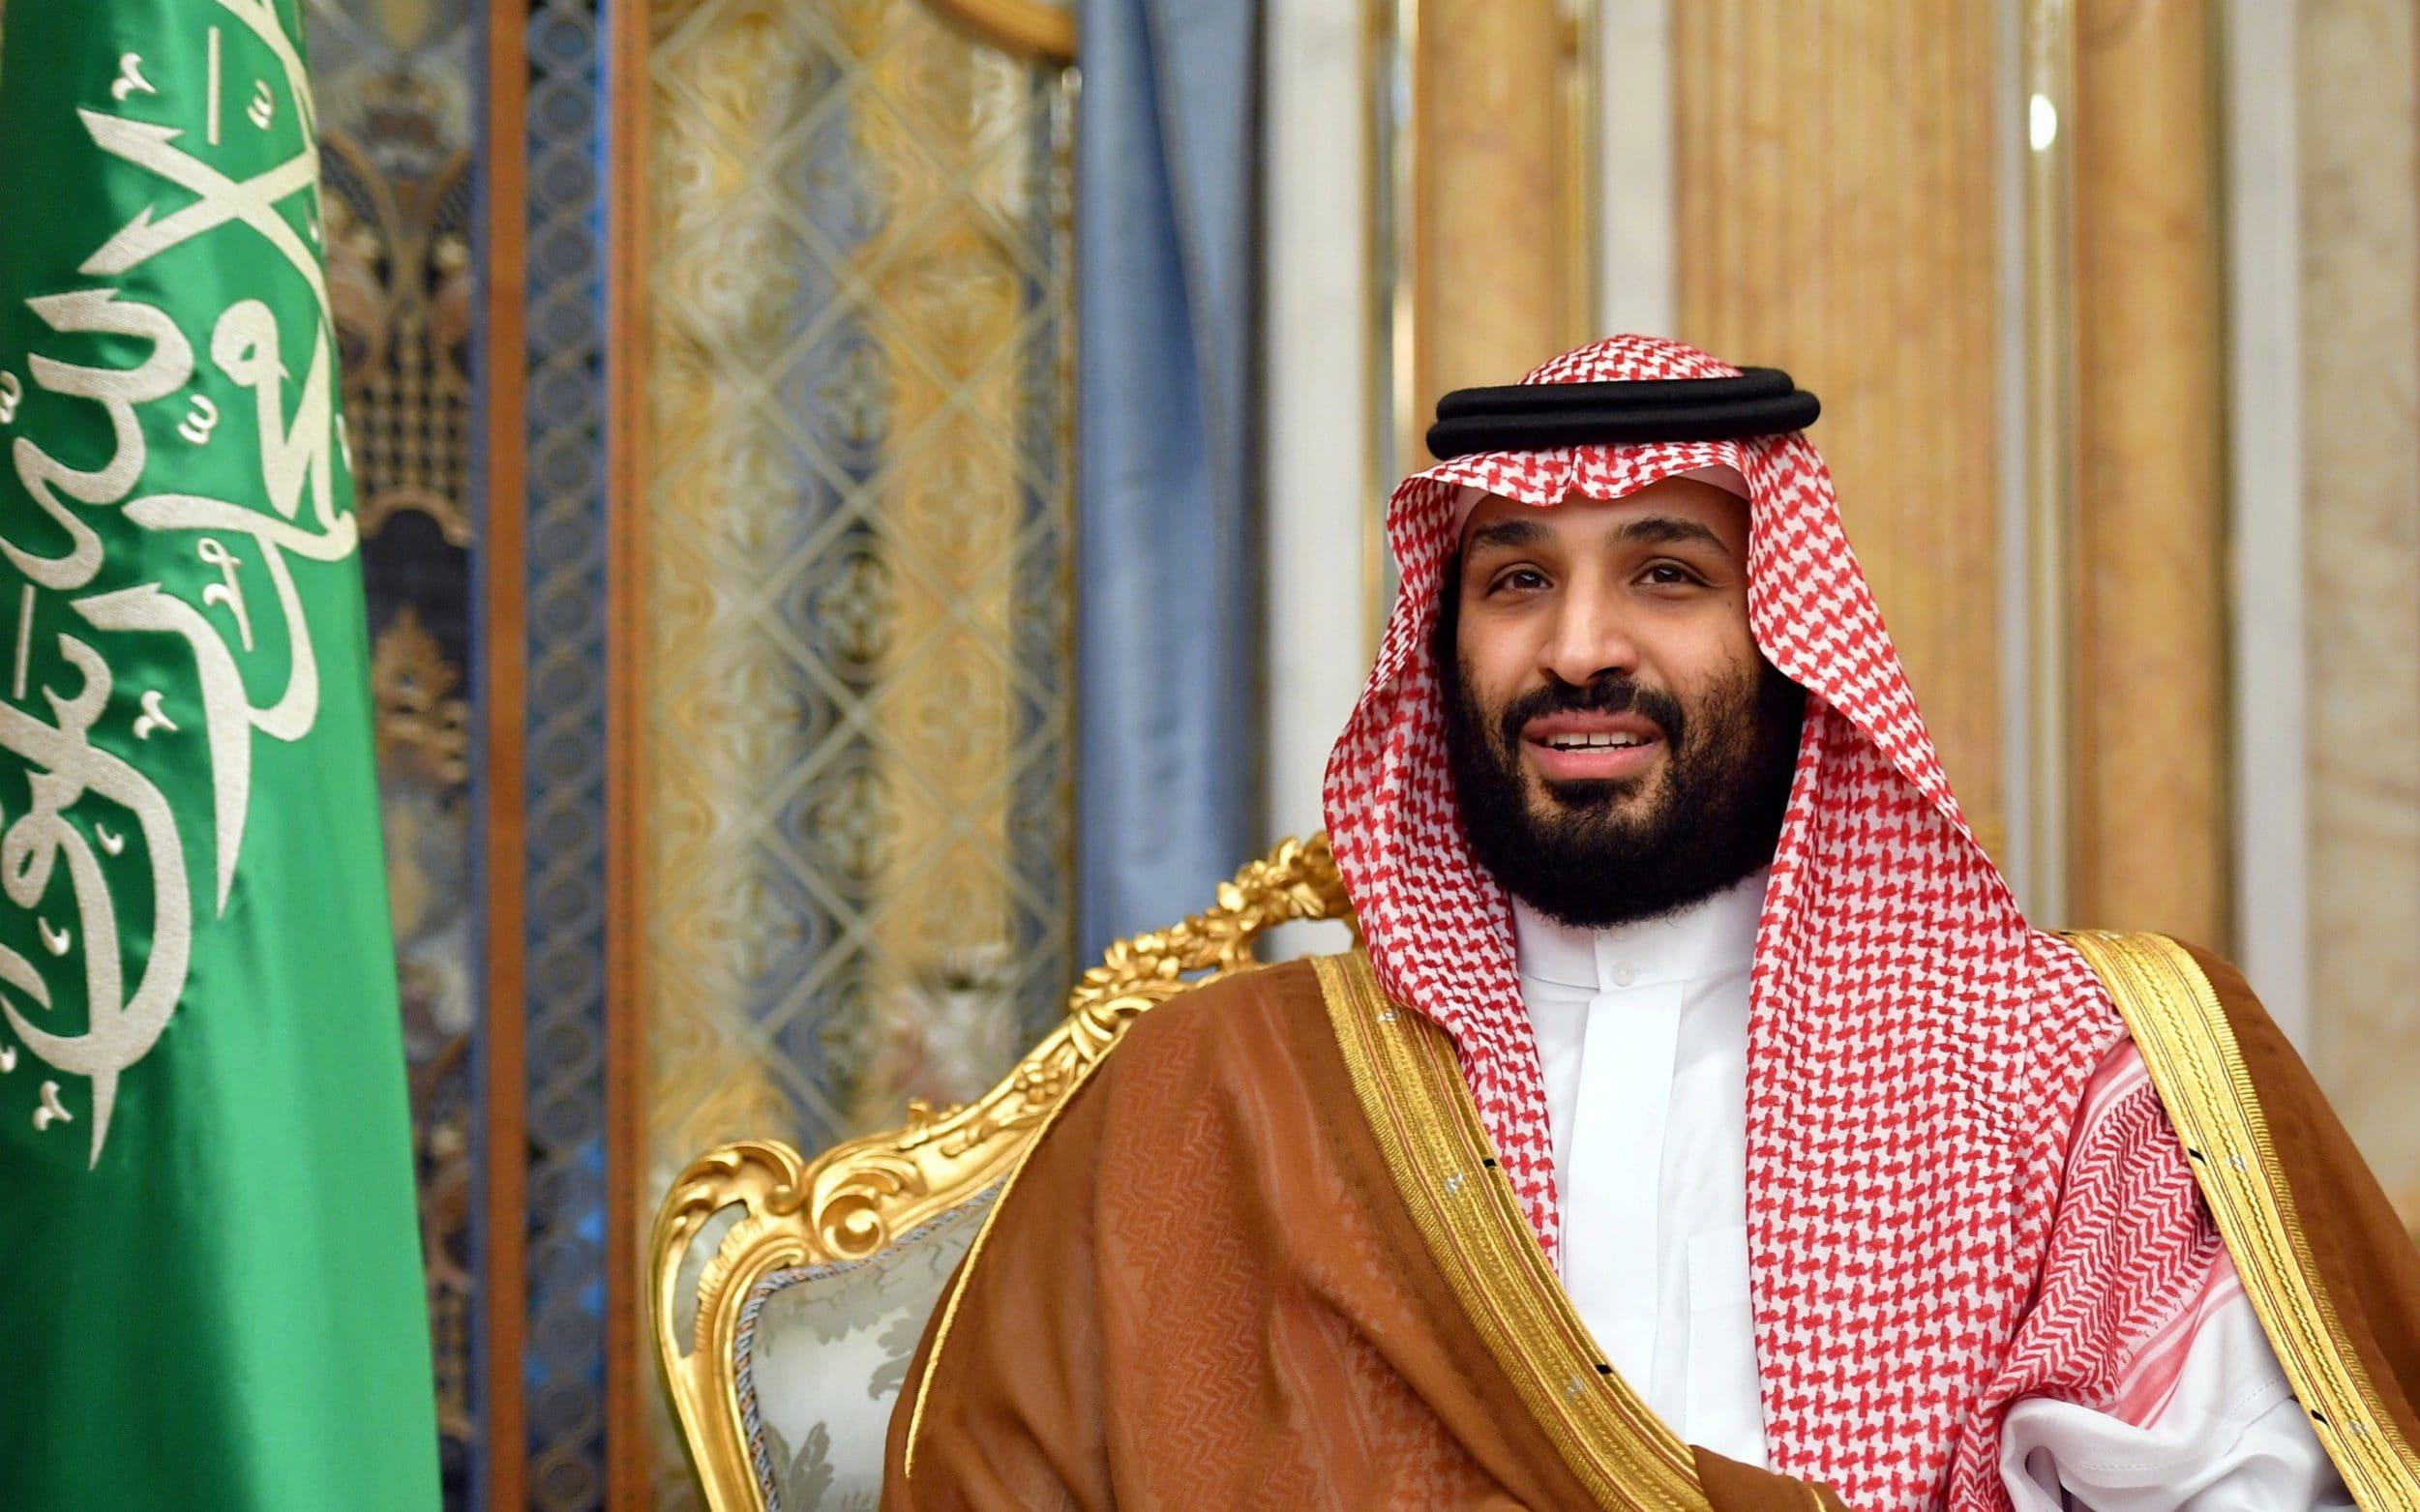 Former Saudi official accuses Mohammad bin Salman of sending hit squad to kill him